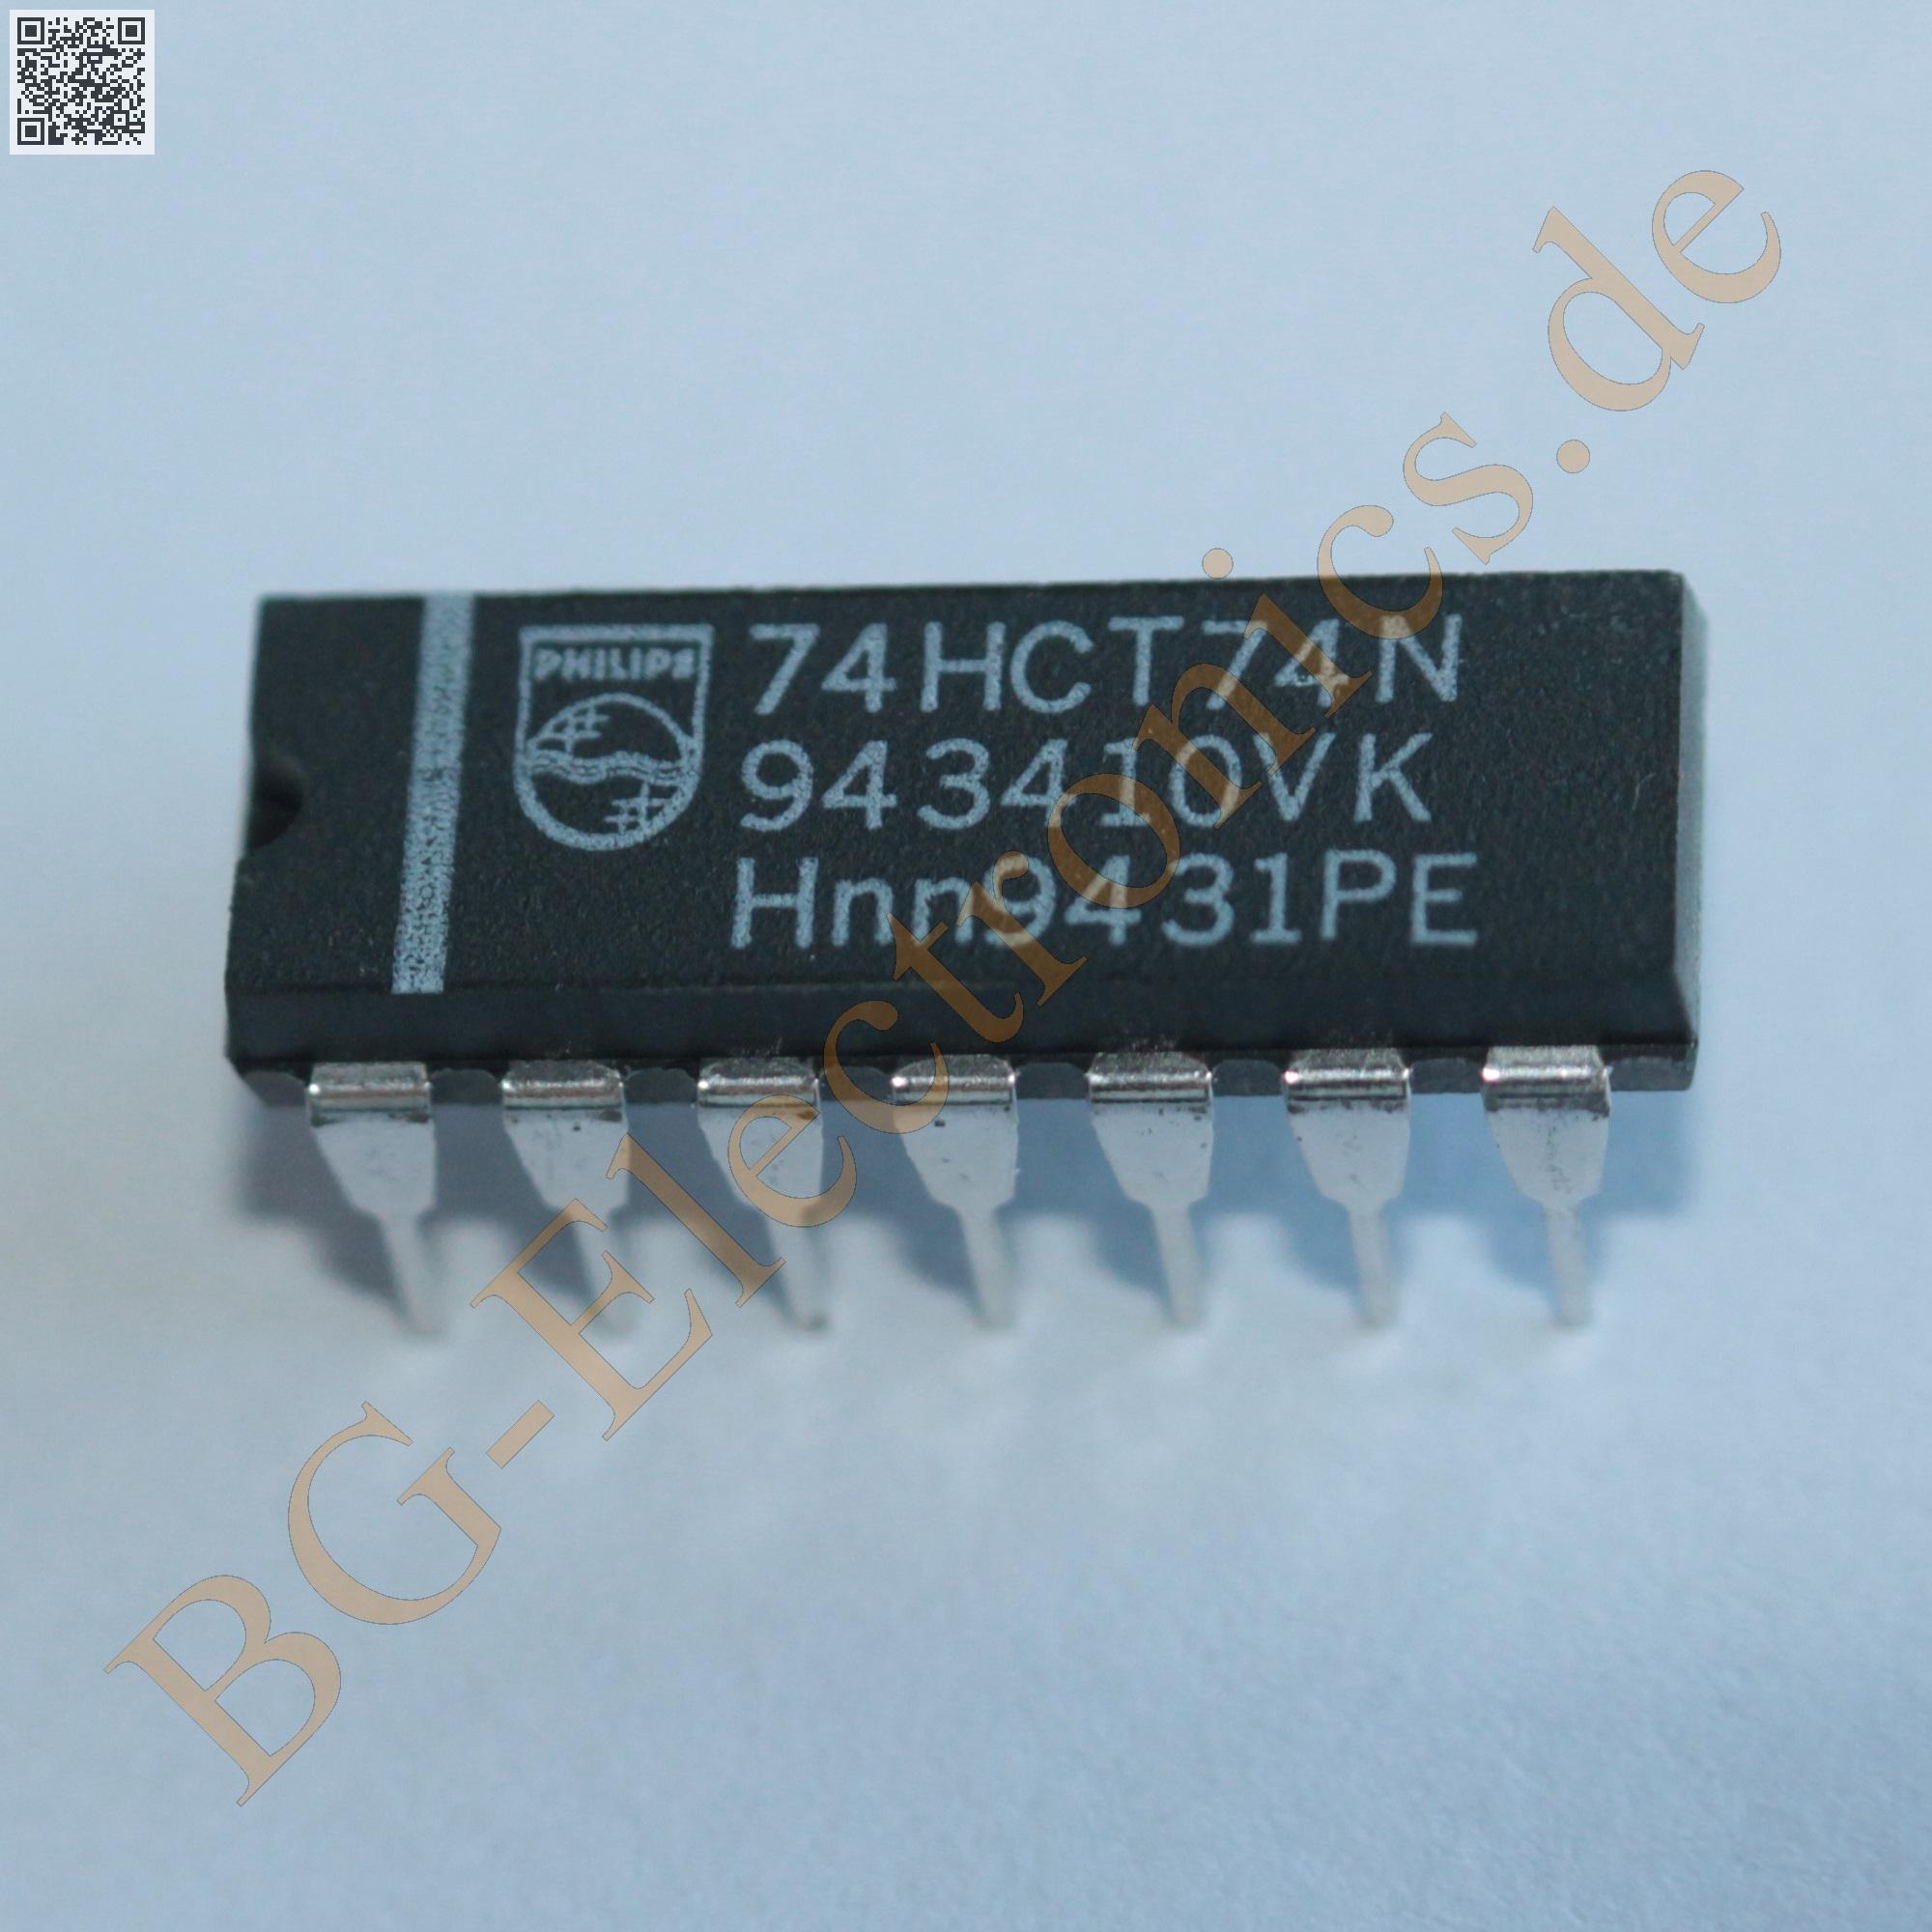 Hcf4051be Pdf